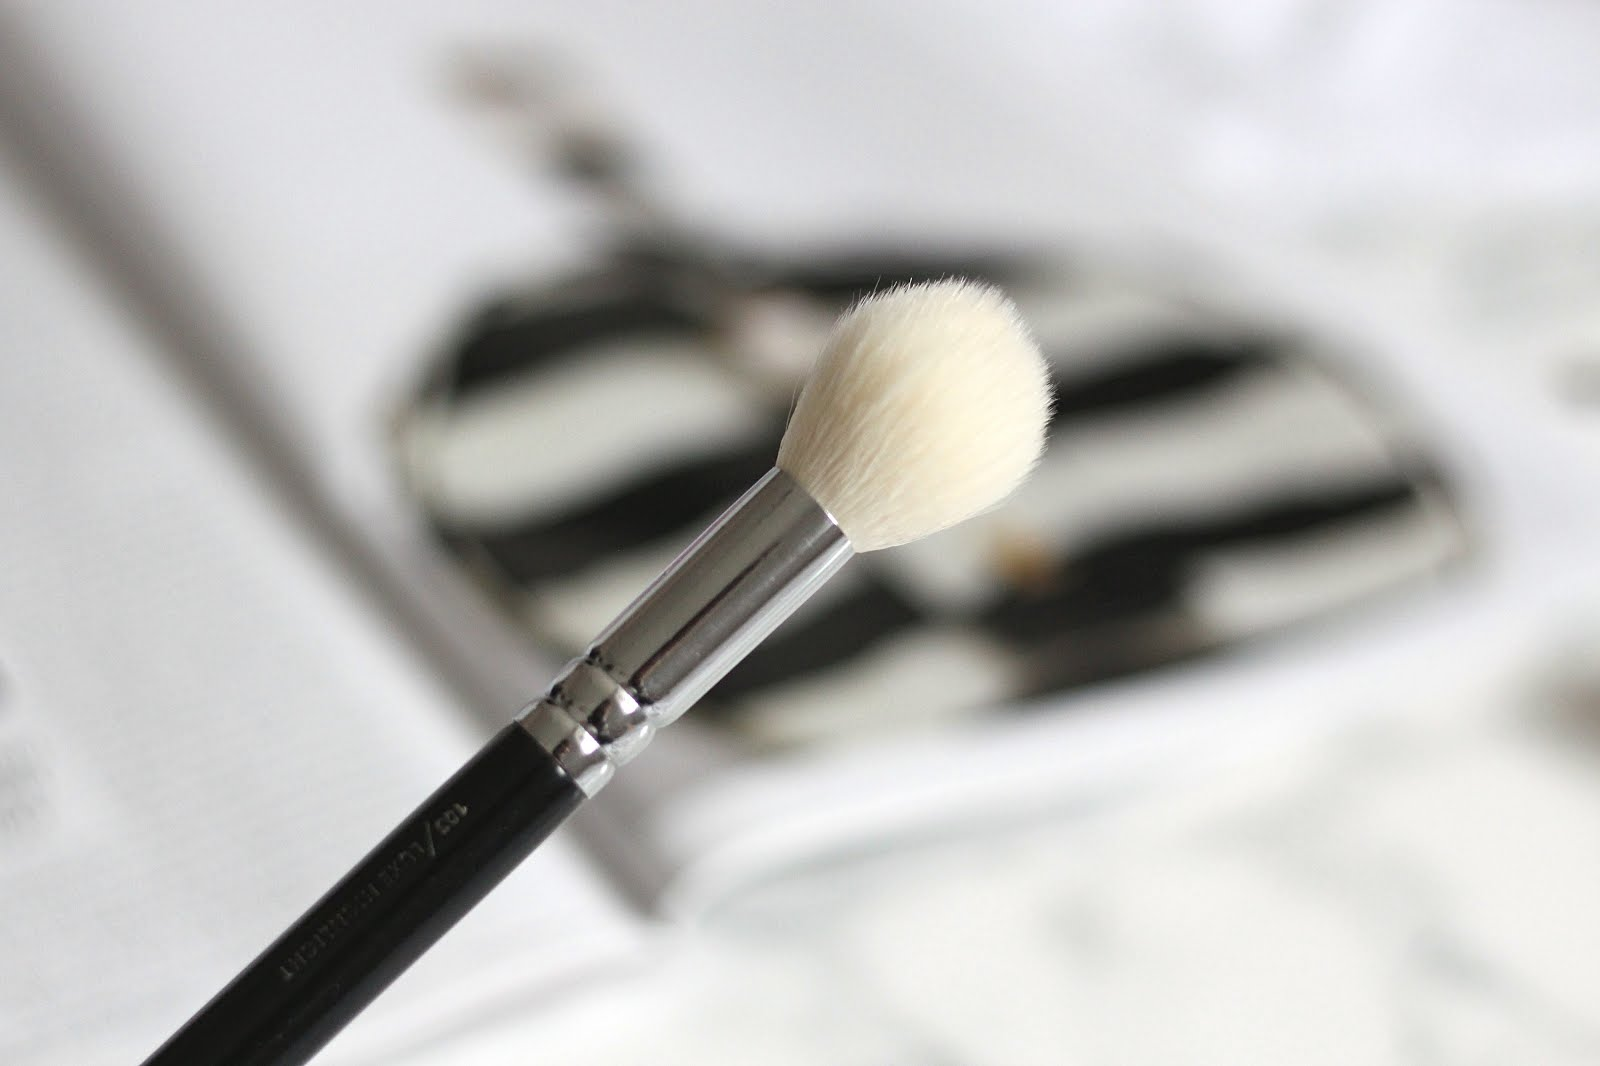 zoeva, zoeva brushes, favorite zoeva brushes, zoeva face paint brush, zoeva, nelly ray, nelly ray blog, blogger, beauty blog, beauty blogger, fashion, fashion blog